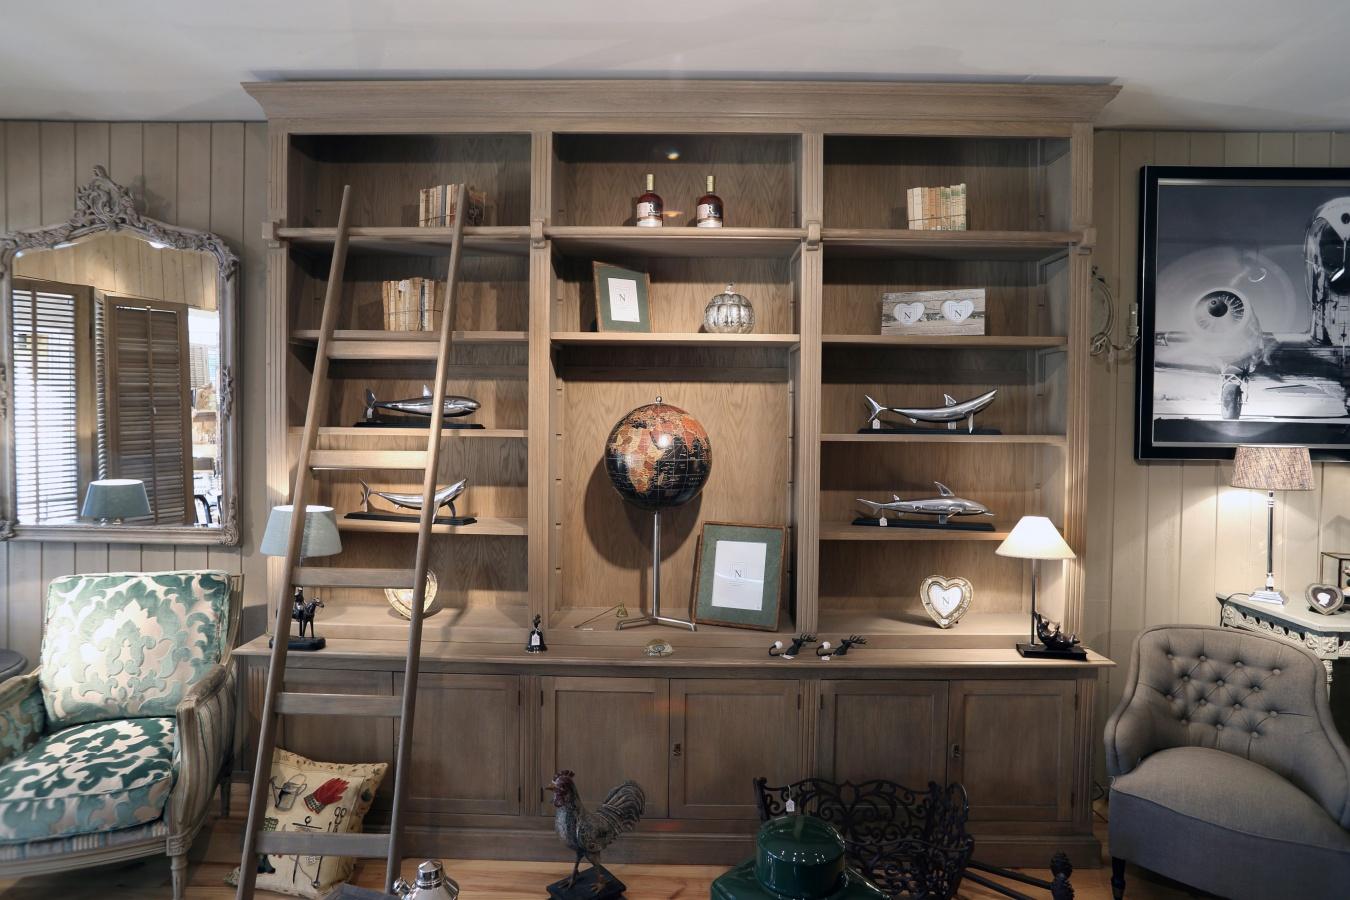 d coration sur mesure meuble biblioth que canap n home cap ferret. Black Bedroom Furniture Sets. Home Design Ideas